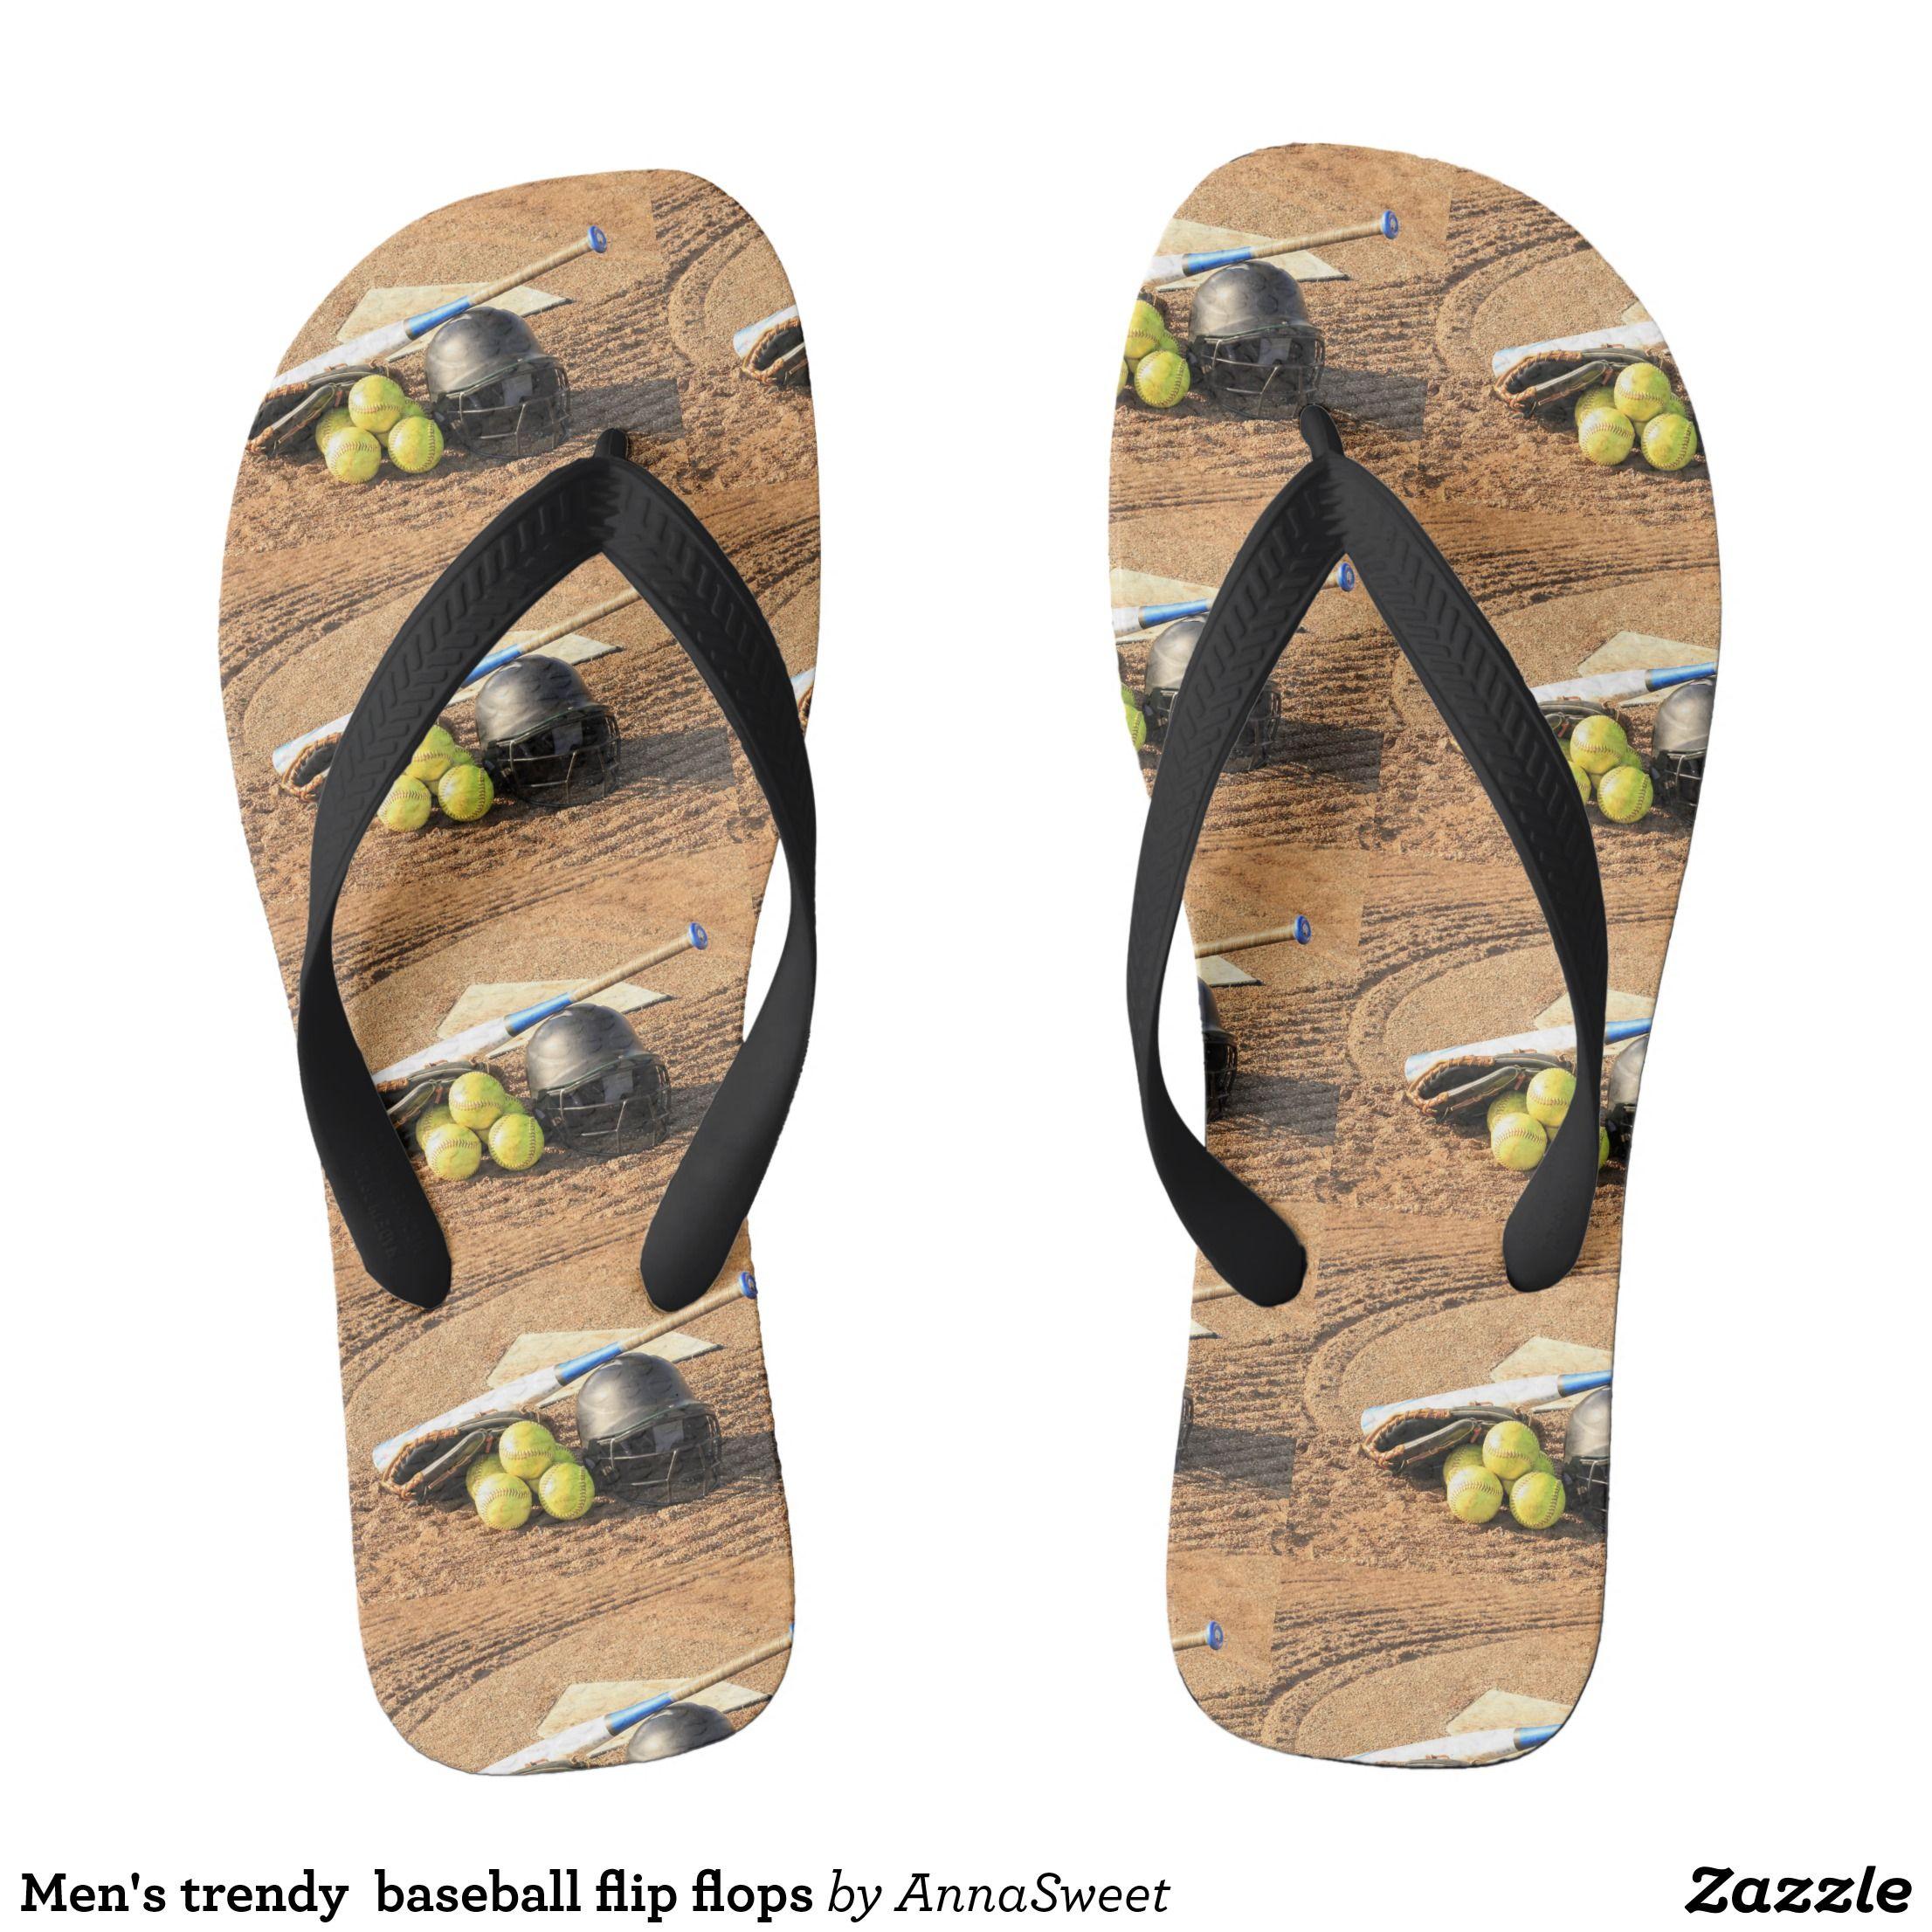 Men S Trendy Baseball Flip Flops Durable Style Hawaiian Beach Sandals By Talented Fashion Graphic Designers Flipflops Hawaii